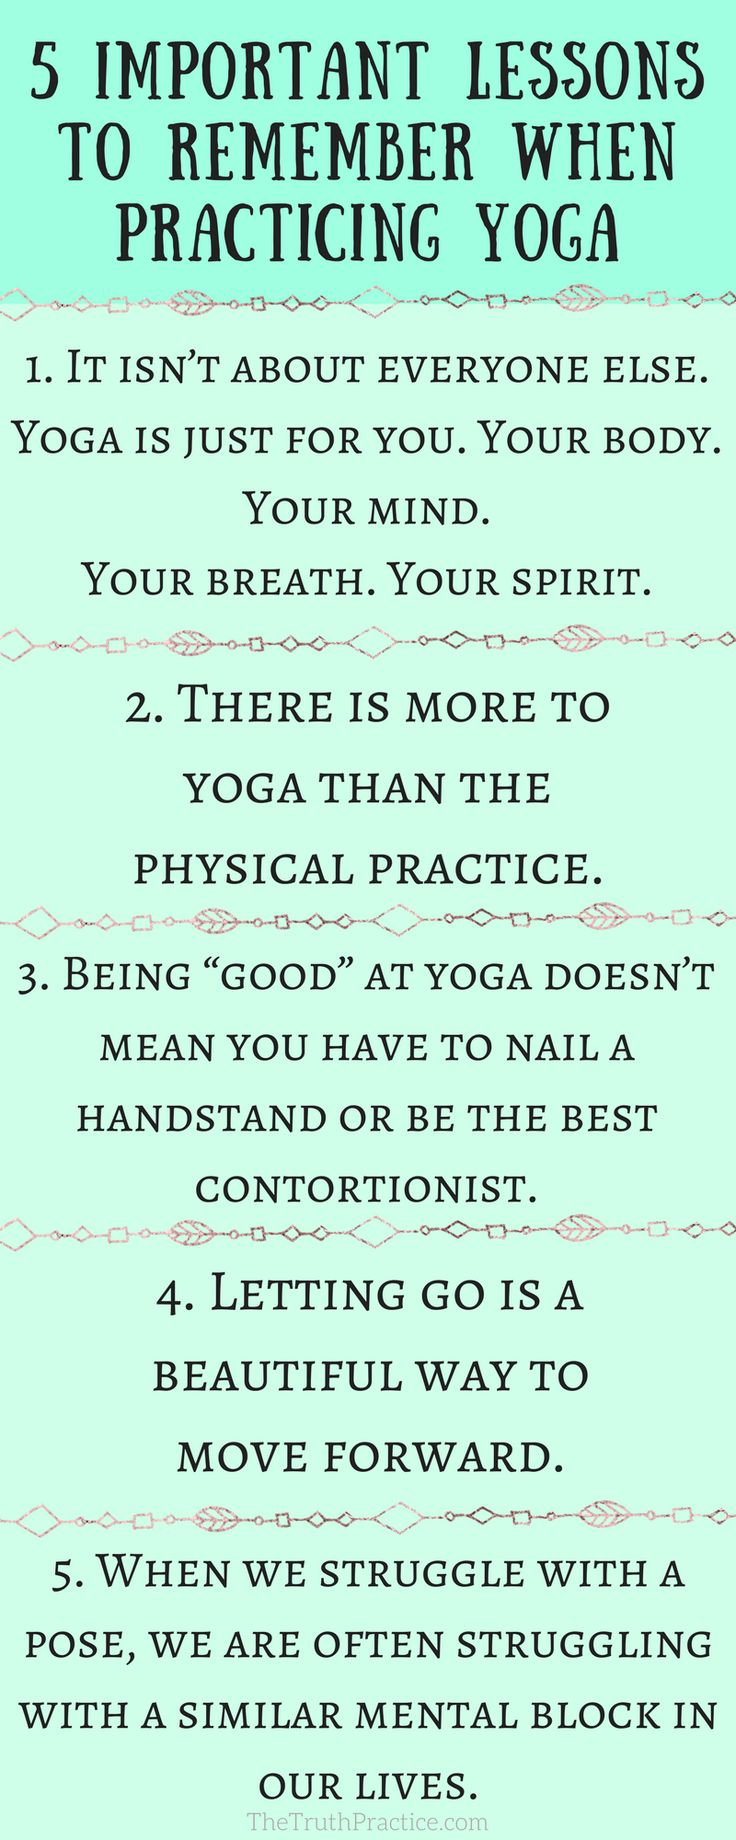 (notitle) – Yoga, Spirituality & Meditation